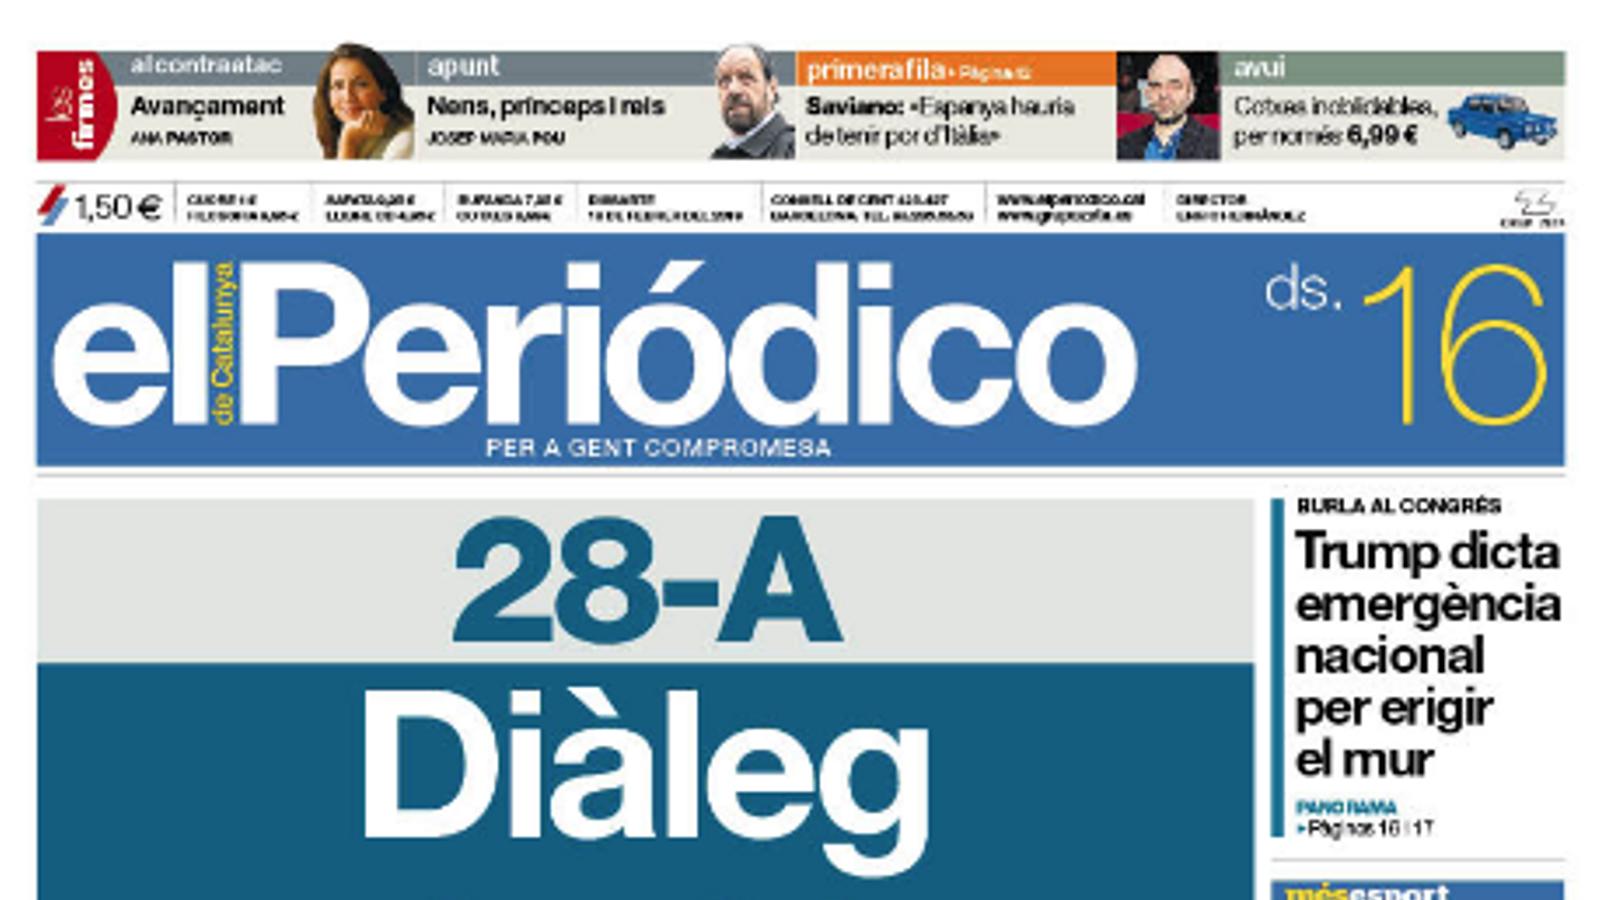 portada periodico 16/02/19